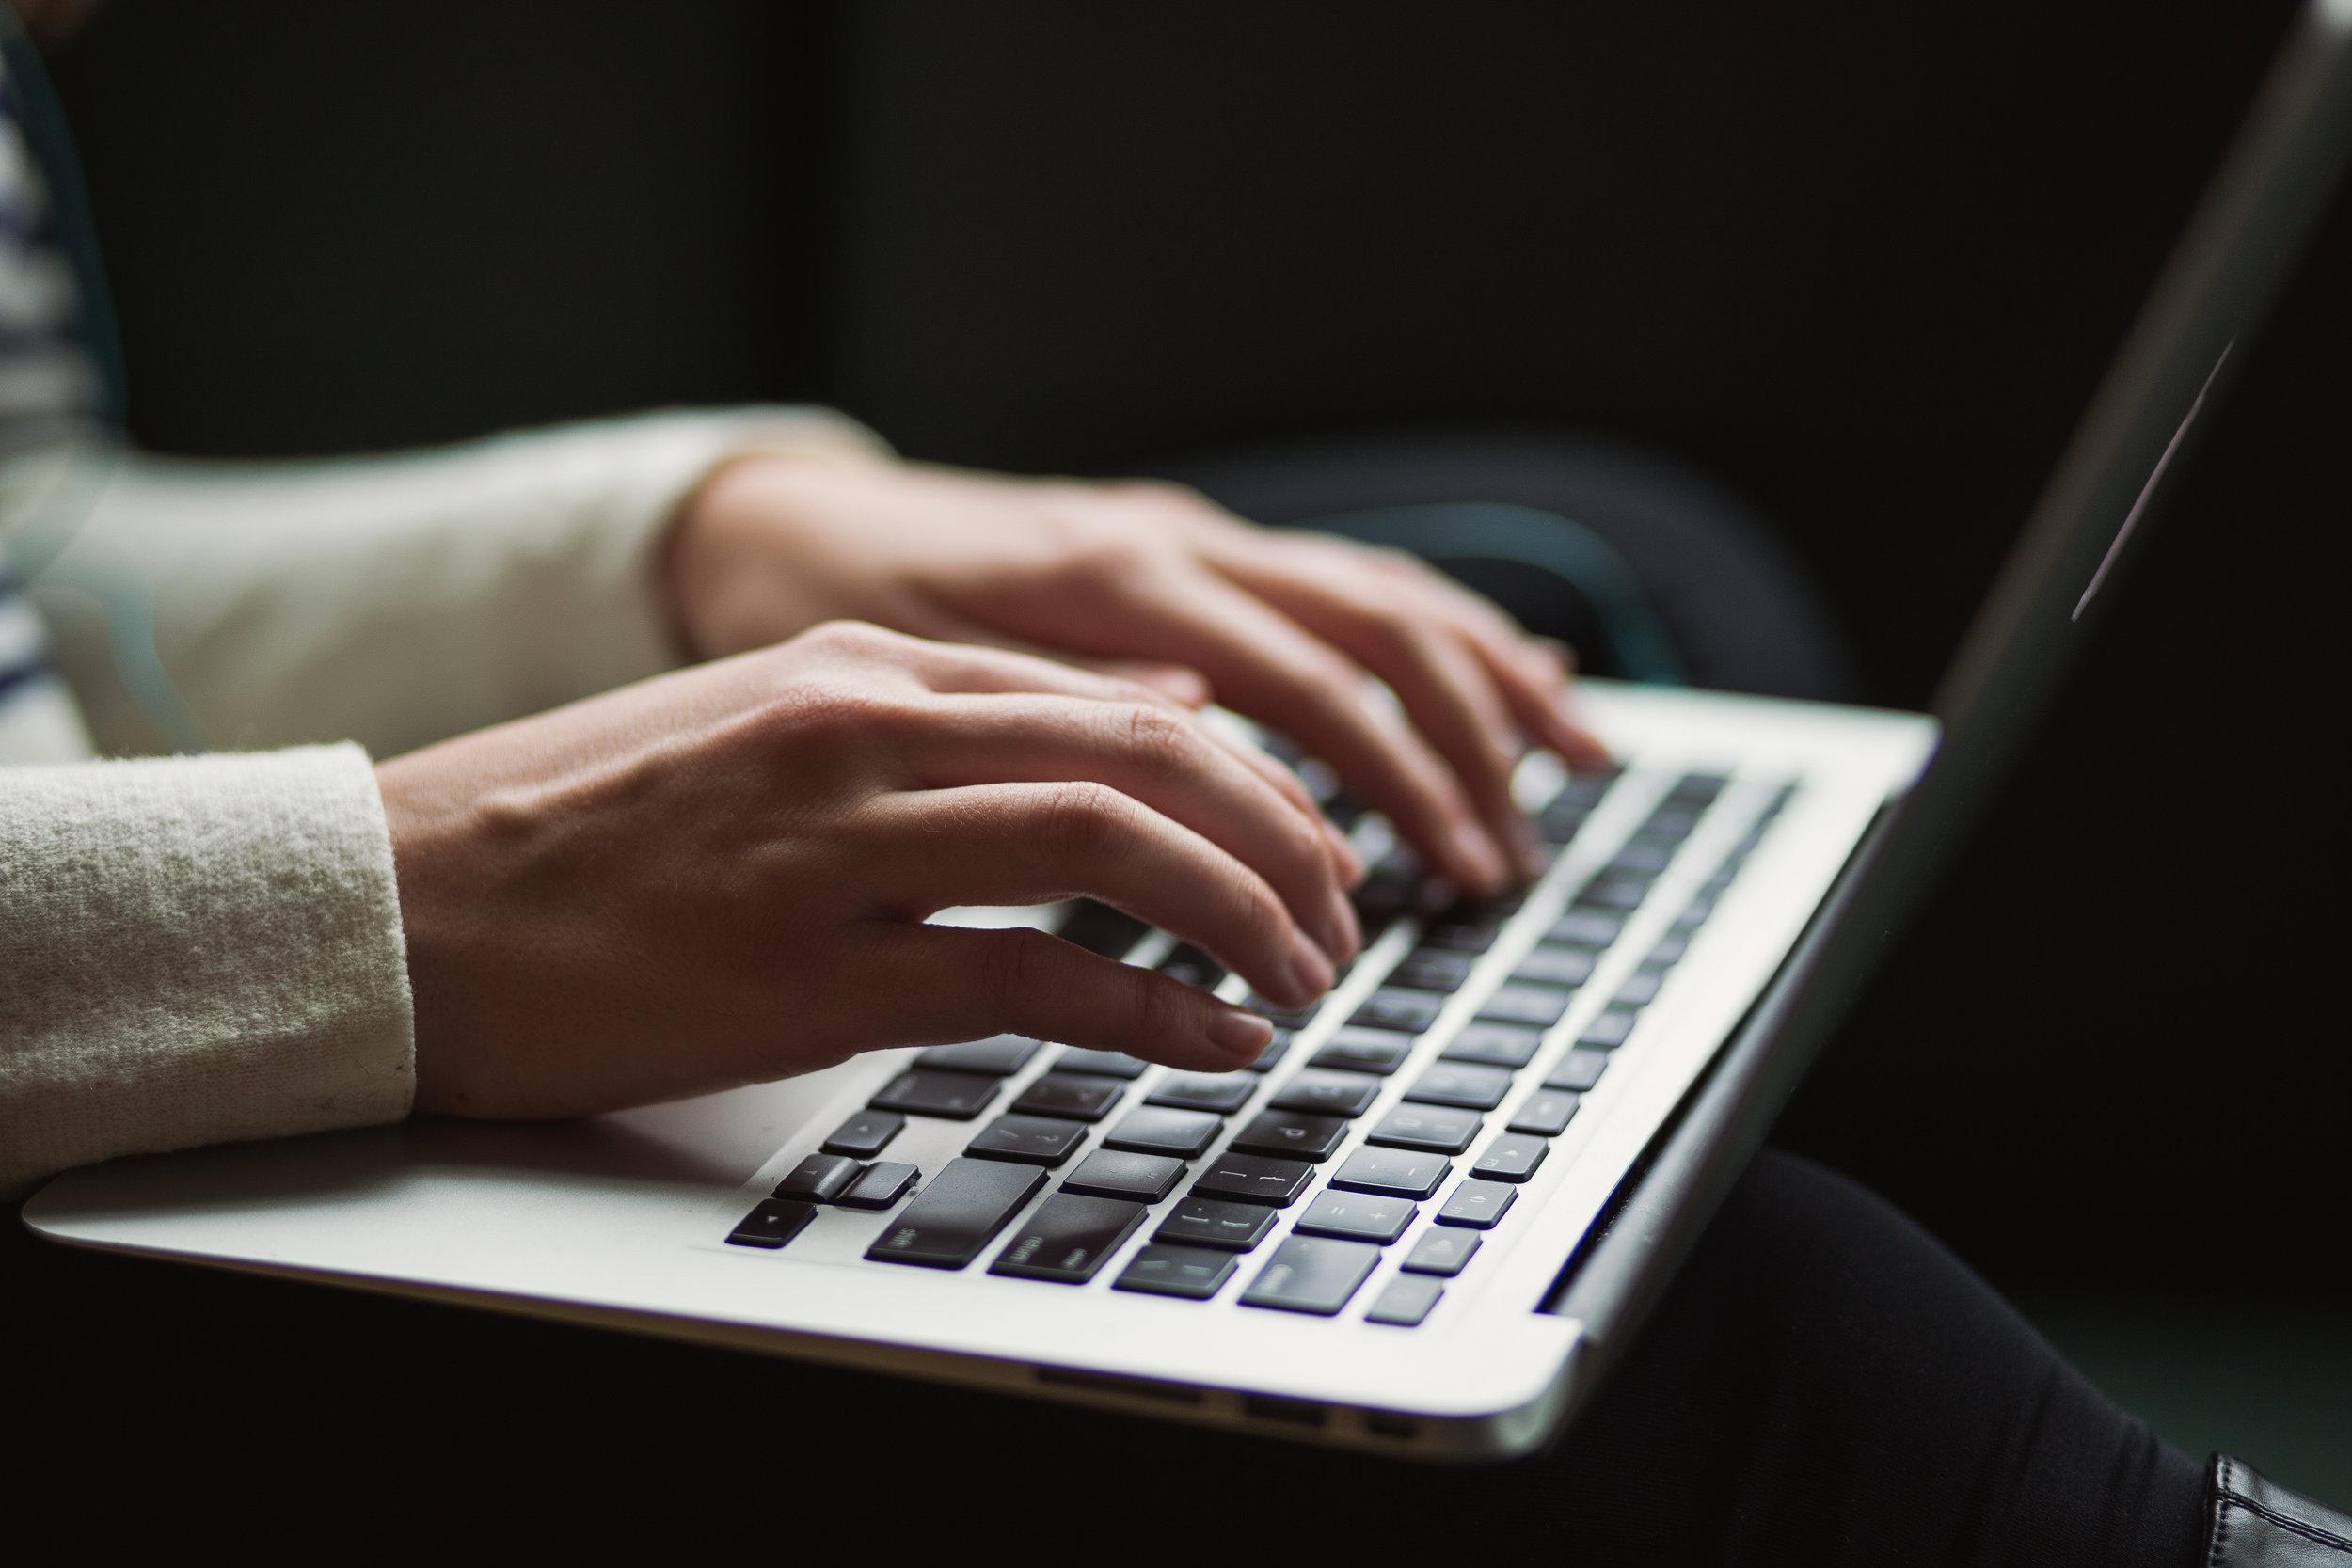 Woman's hands on a laptop keyboard